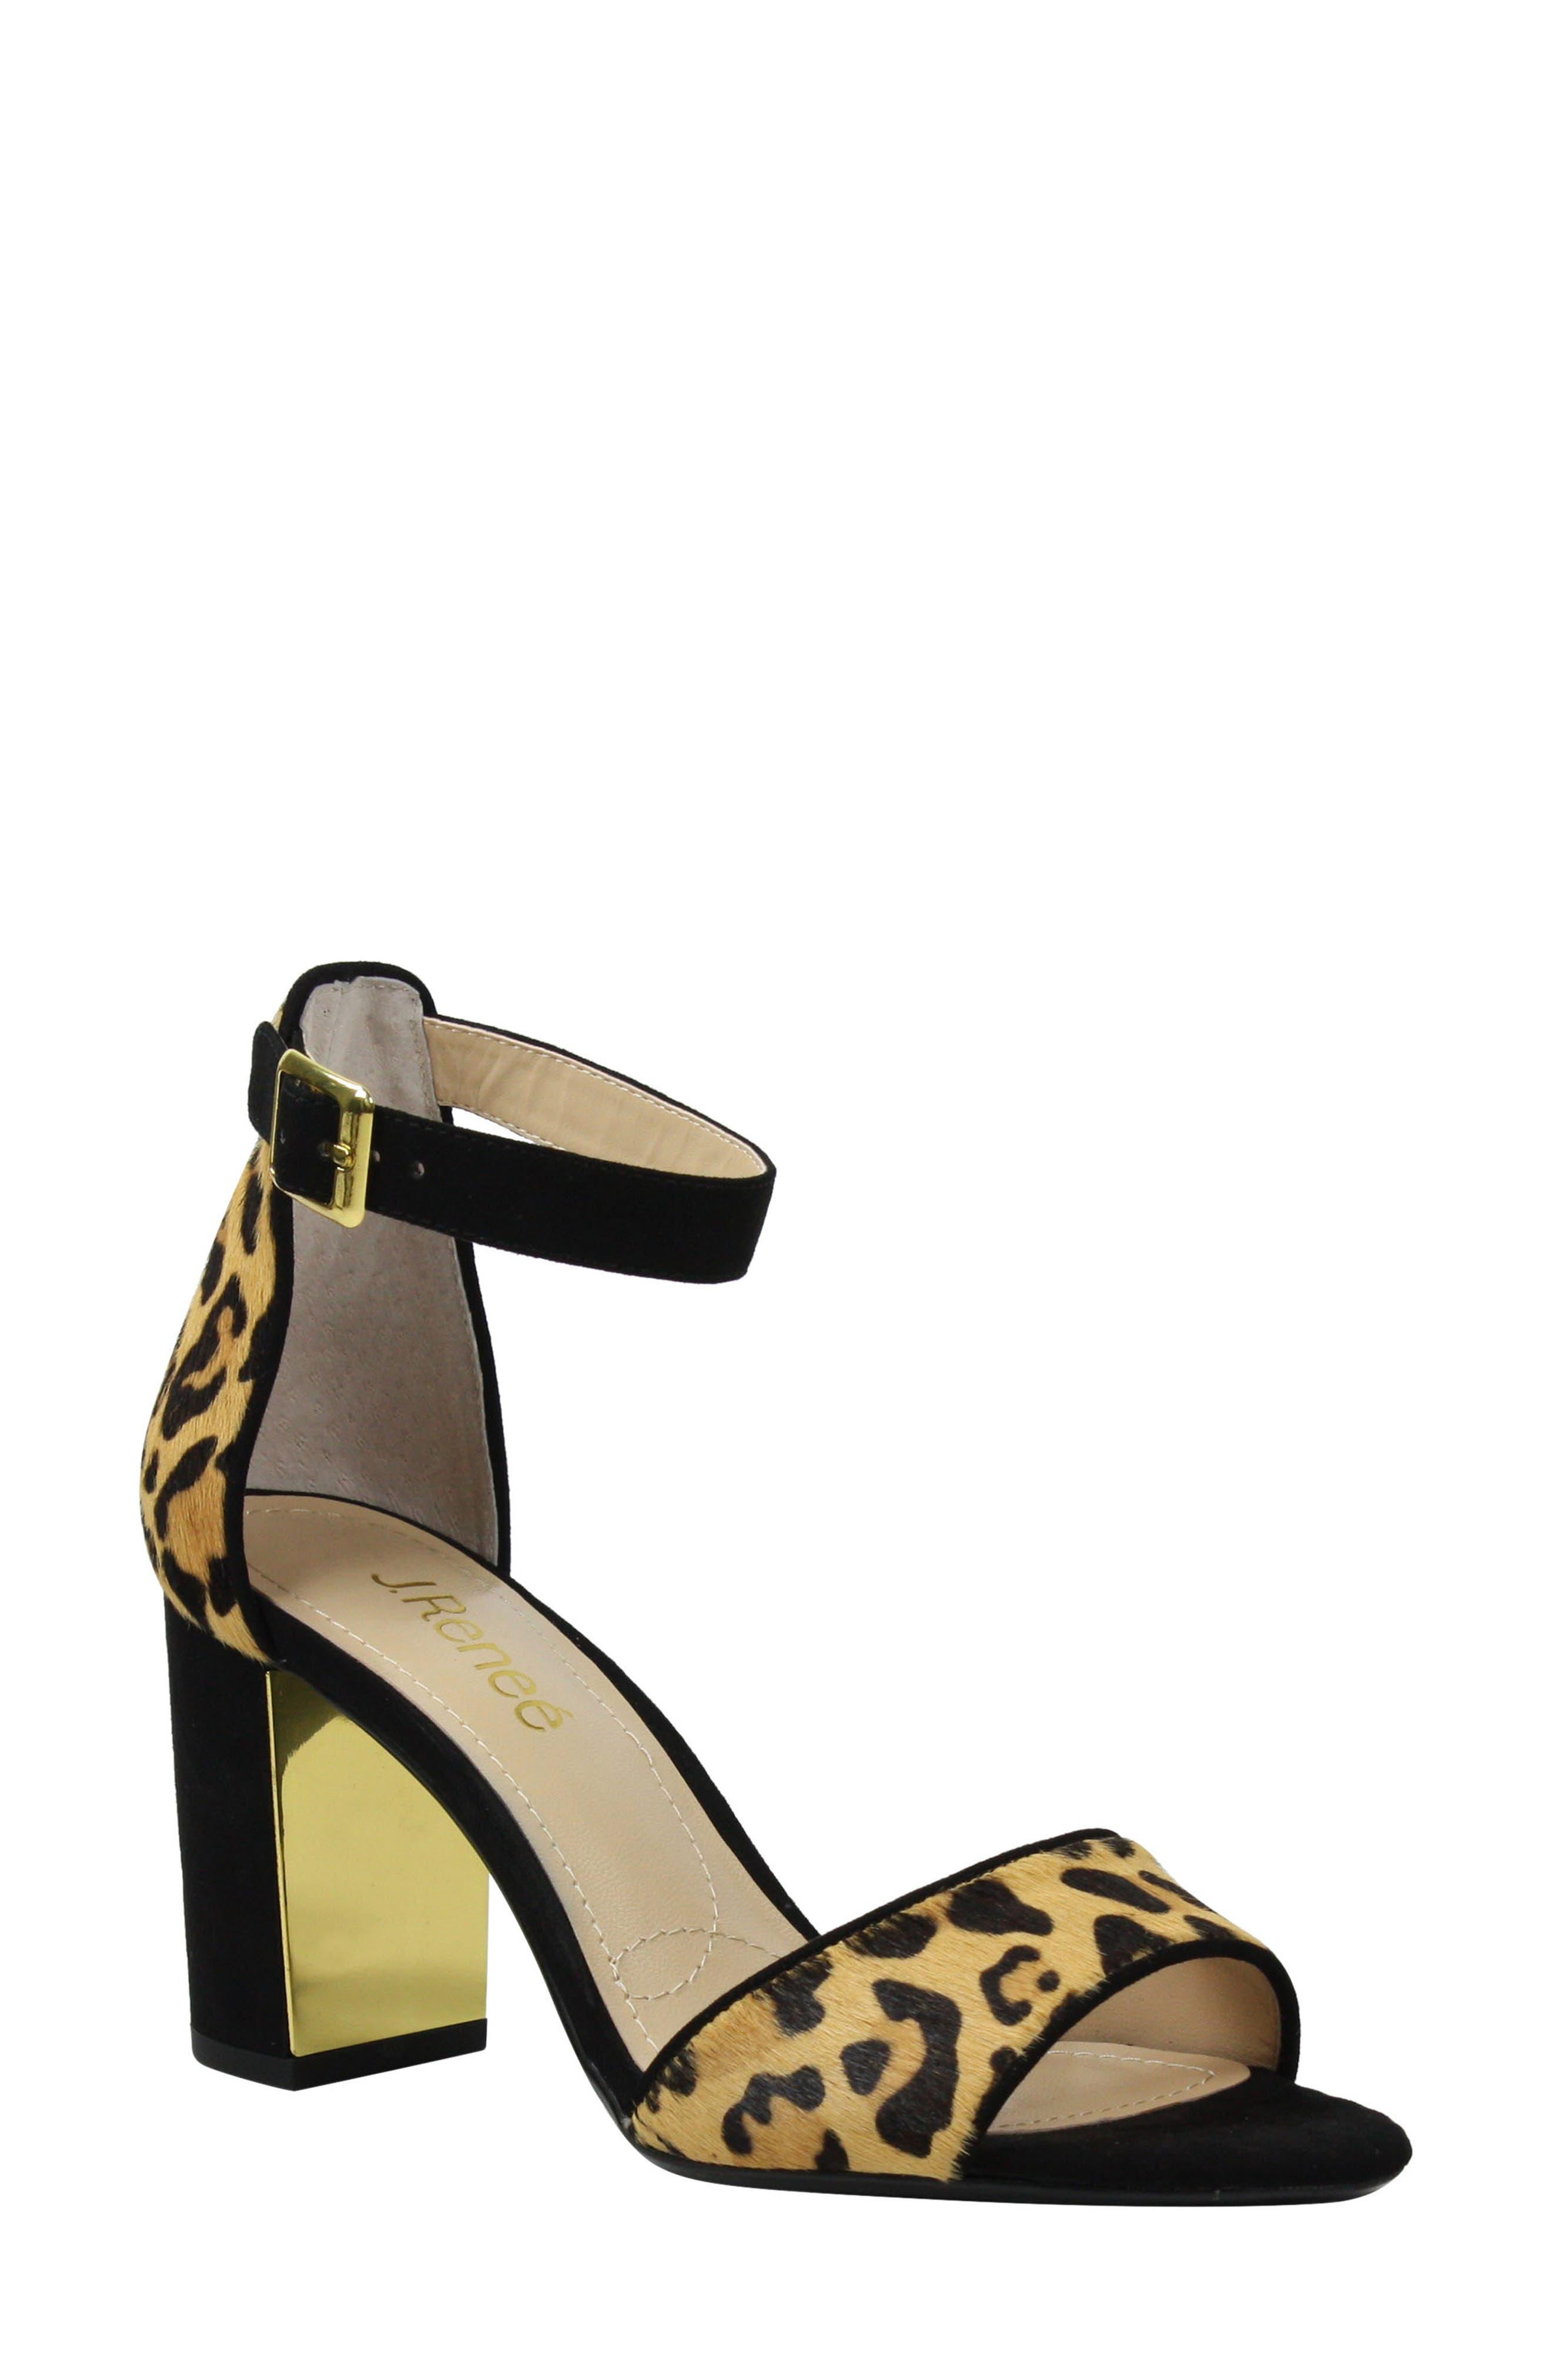 J. RENEÉ Flaviana Ankle Strap Sandal, Main, color, BLACK/ BROWN CALF HAIR